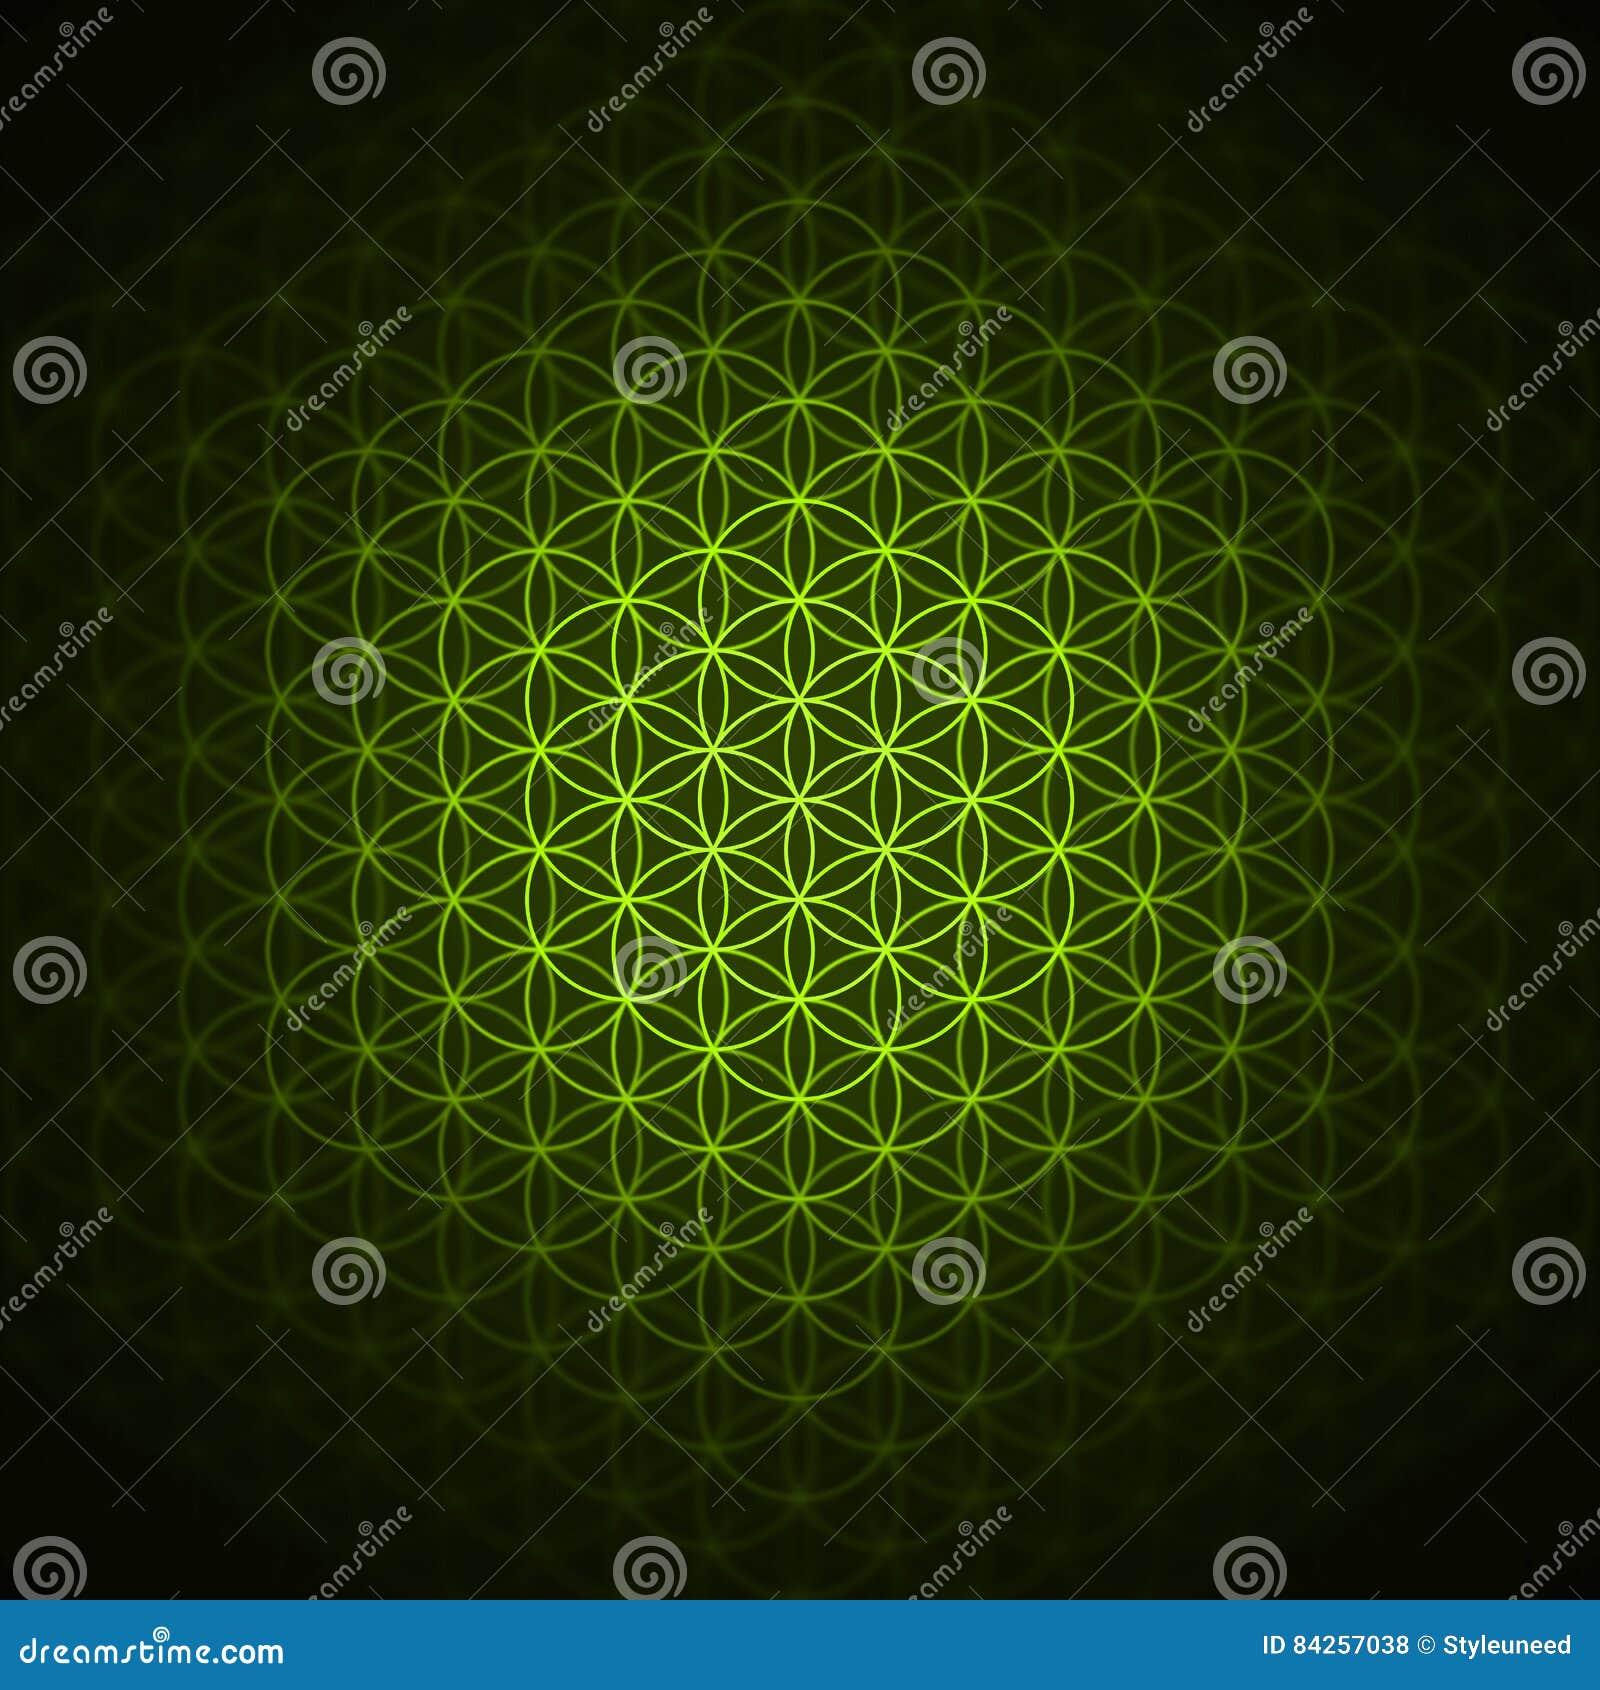 Genesis Pattern The Flower Of Life Green Stock